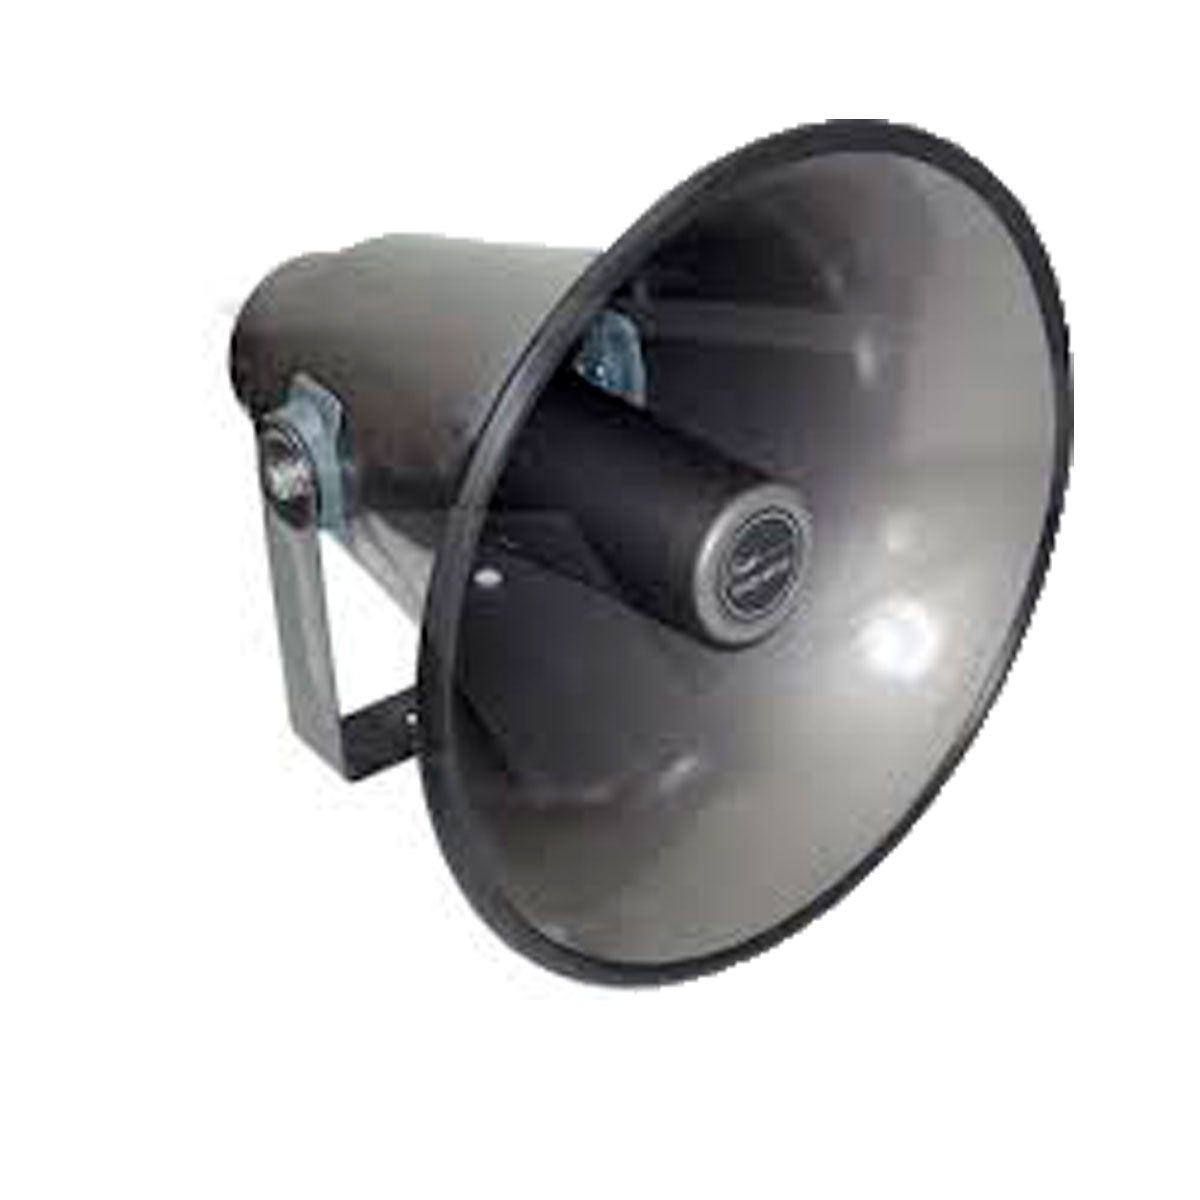 Altavoz TDH-8012 HPAUDIO